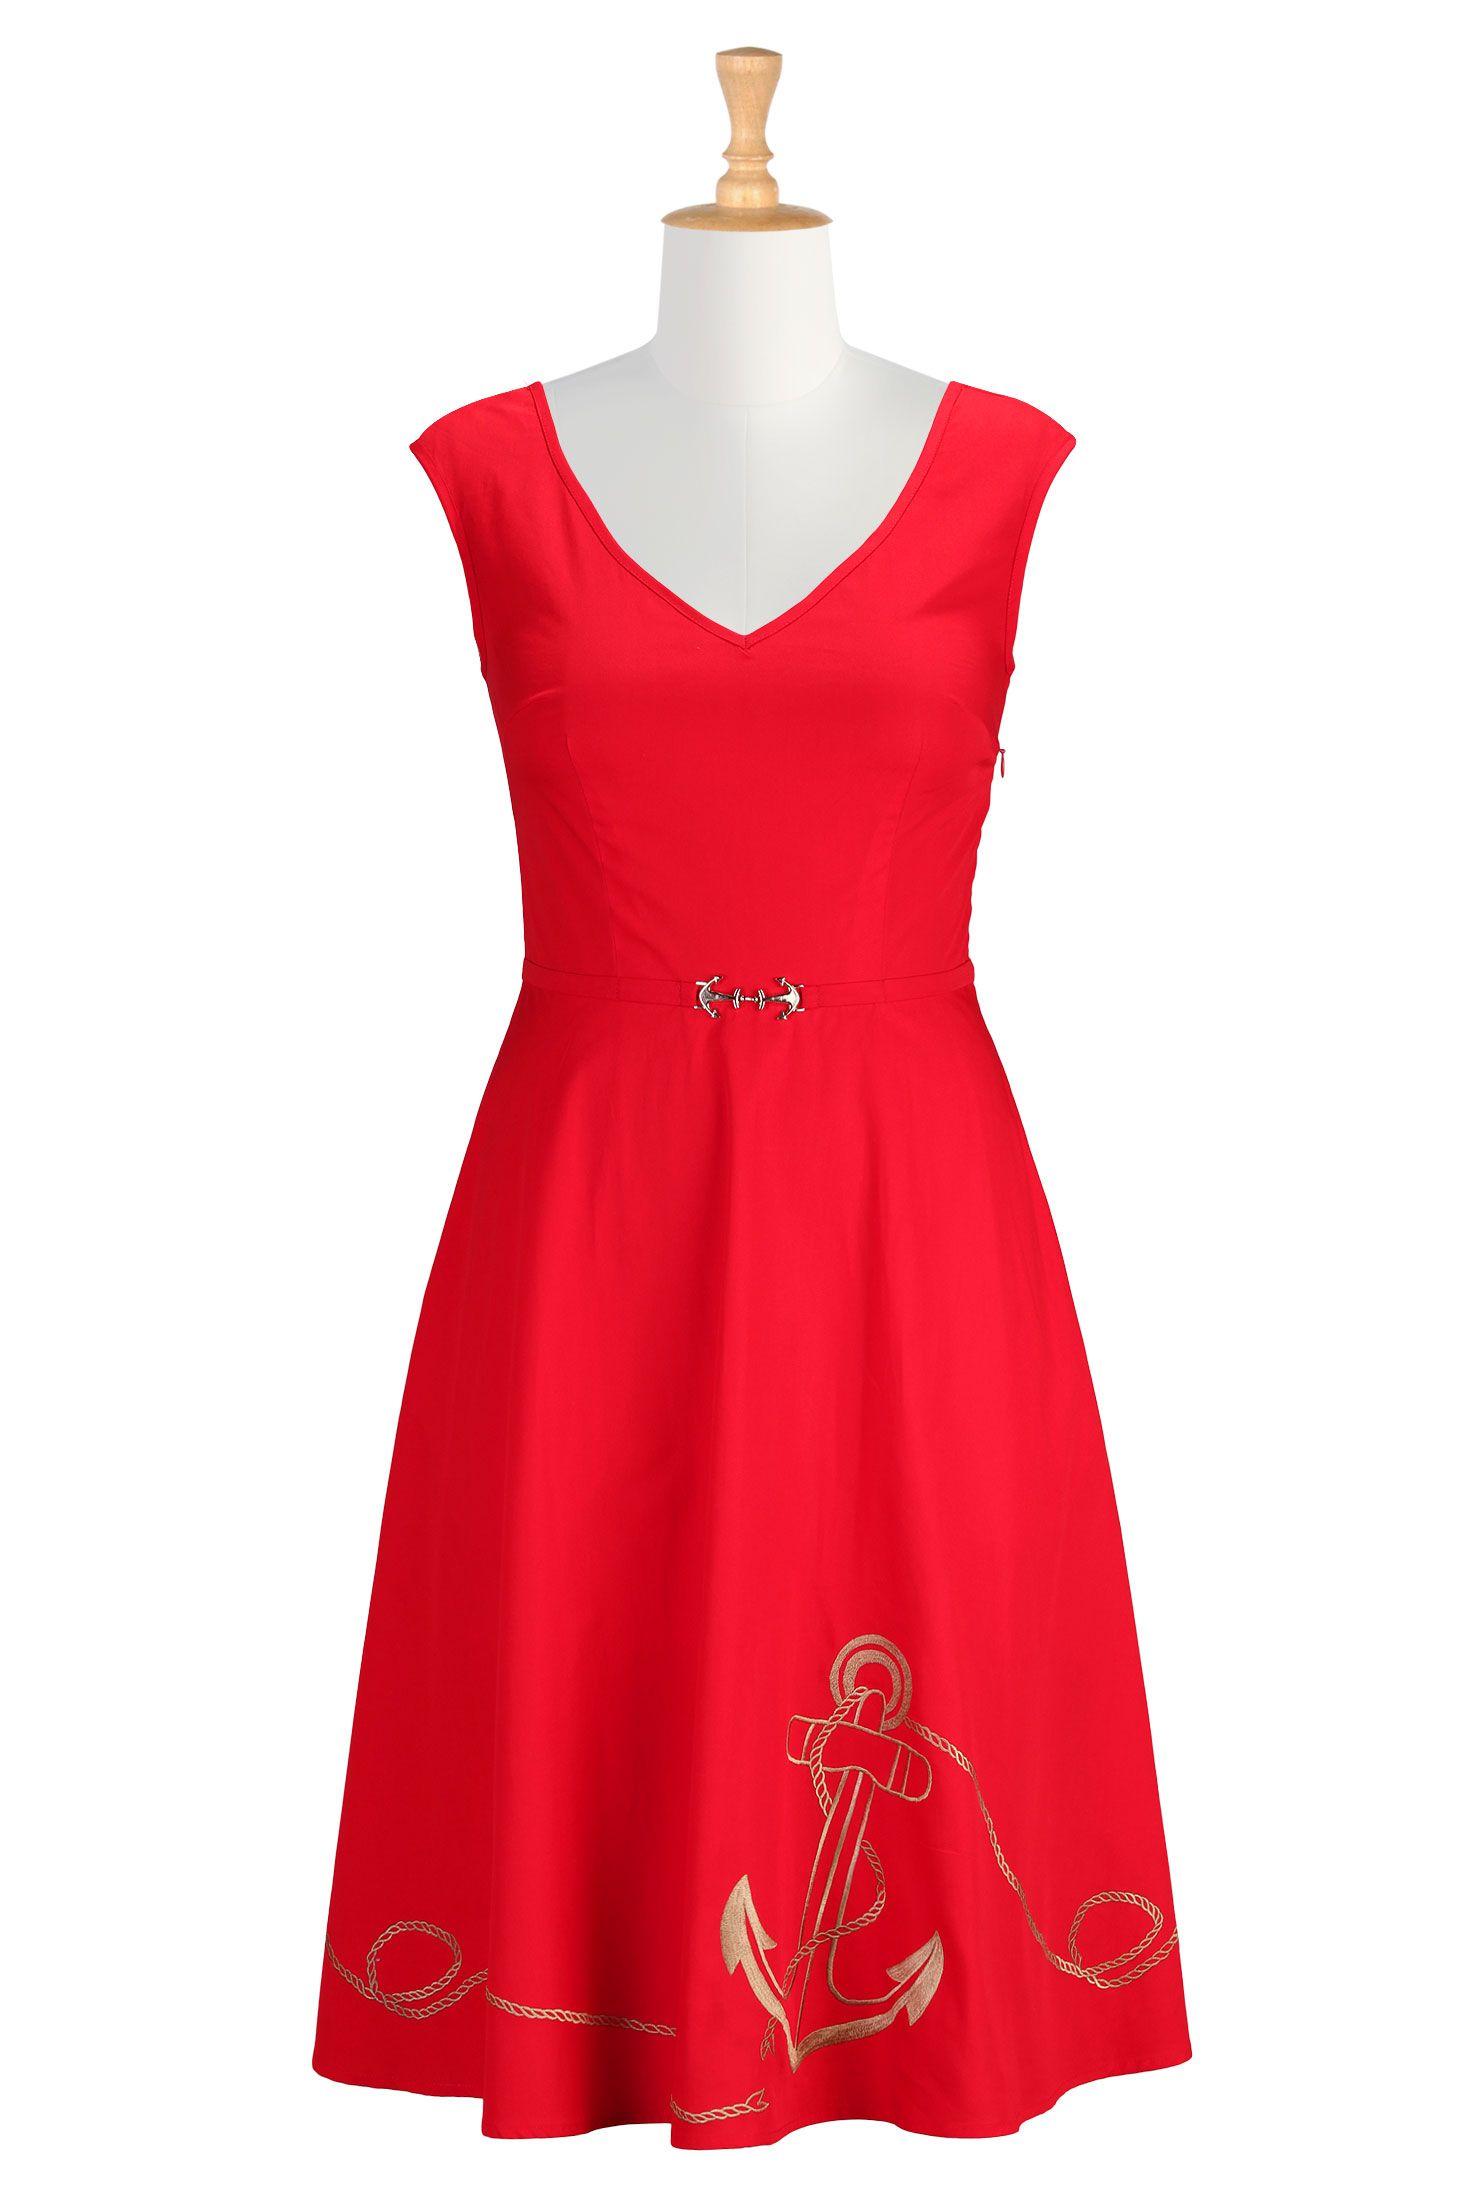 1960s Style Dresses- Retro Inspired Fashion   Dress belts ...